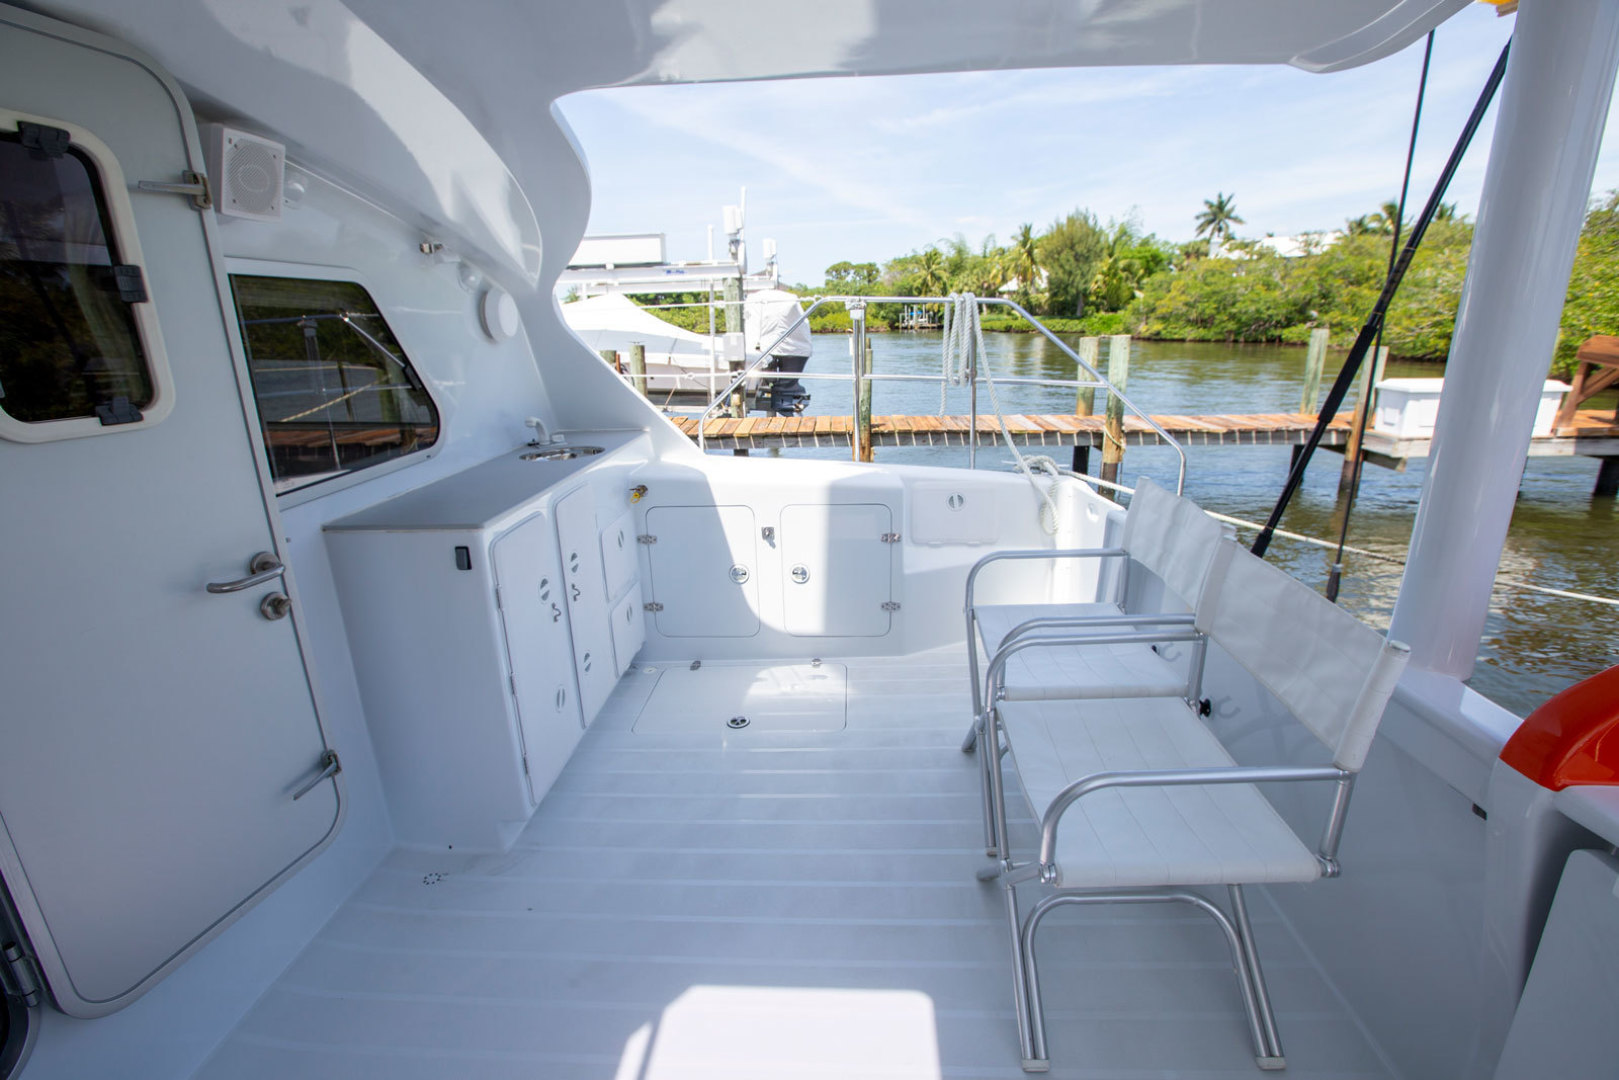 Atlantic-49 Catamaran 2018-Wabi Sabi Stuart-Florida-United States-1399256 | Thumbnail